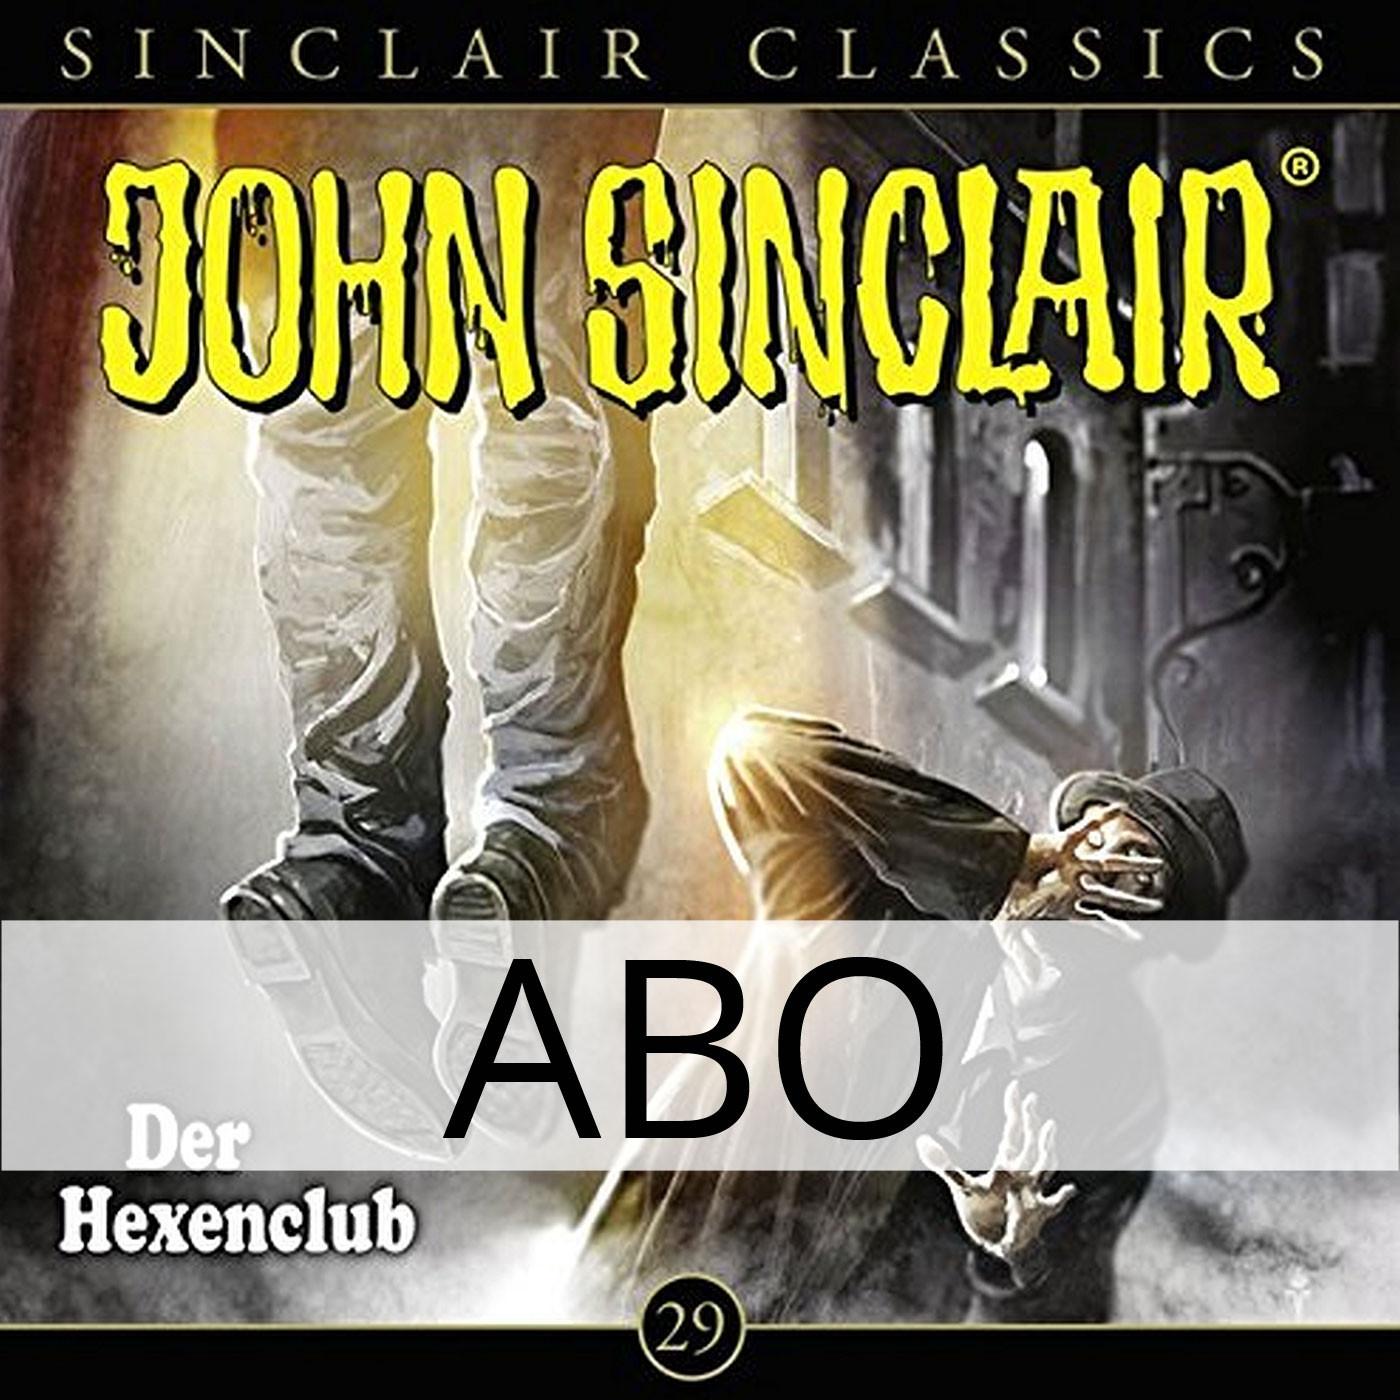 ABO John Sinclair Classics